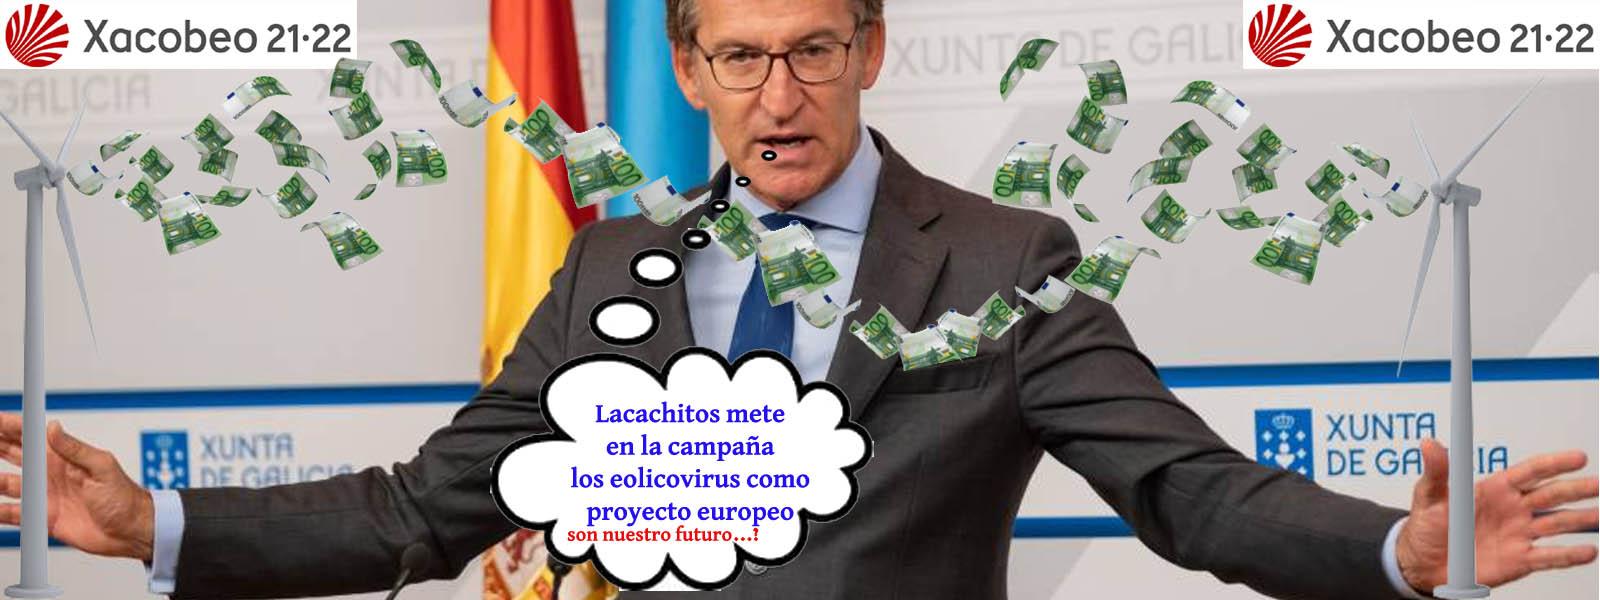 "XornaldeGalicia on Twitter: ""Feijóo y asesora PPdeG aseguran su futuro  regalando #Xacobeo21-22 a eólicas ; @jordievole @delbarriotv @salvadostv  @AntonioMaestre @COPE @diariARA @DebatAlRojoVivo @laSextaTV @orodil  @obloque @telecincoes @telediario_tve ..."